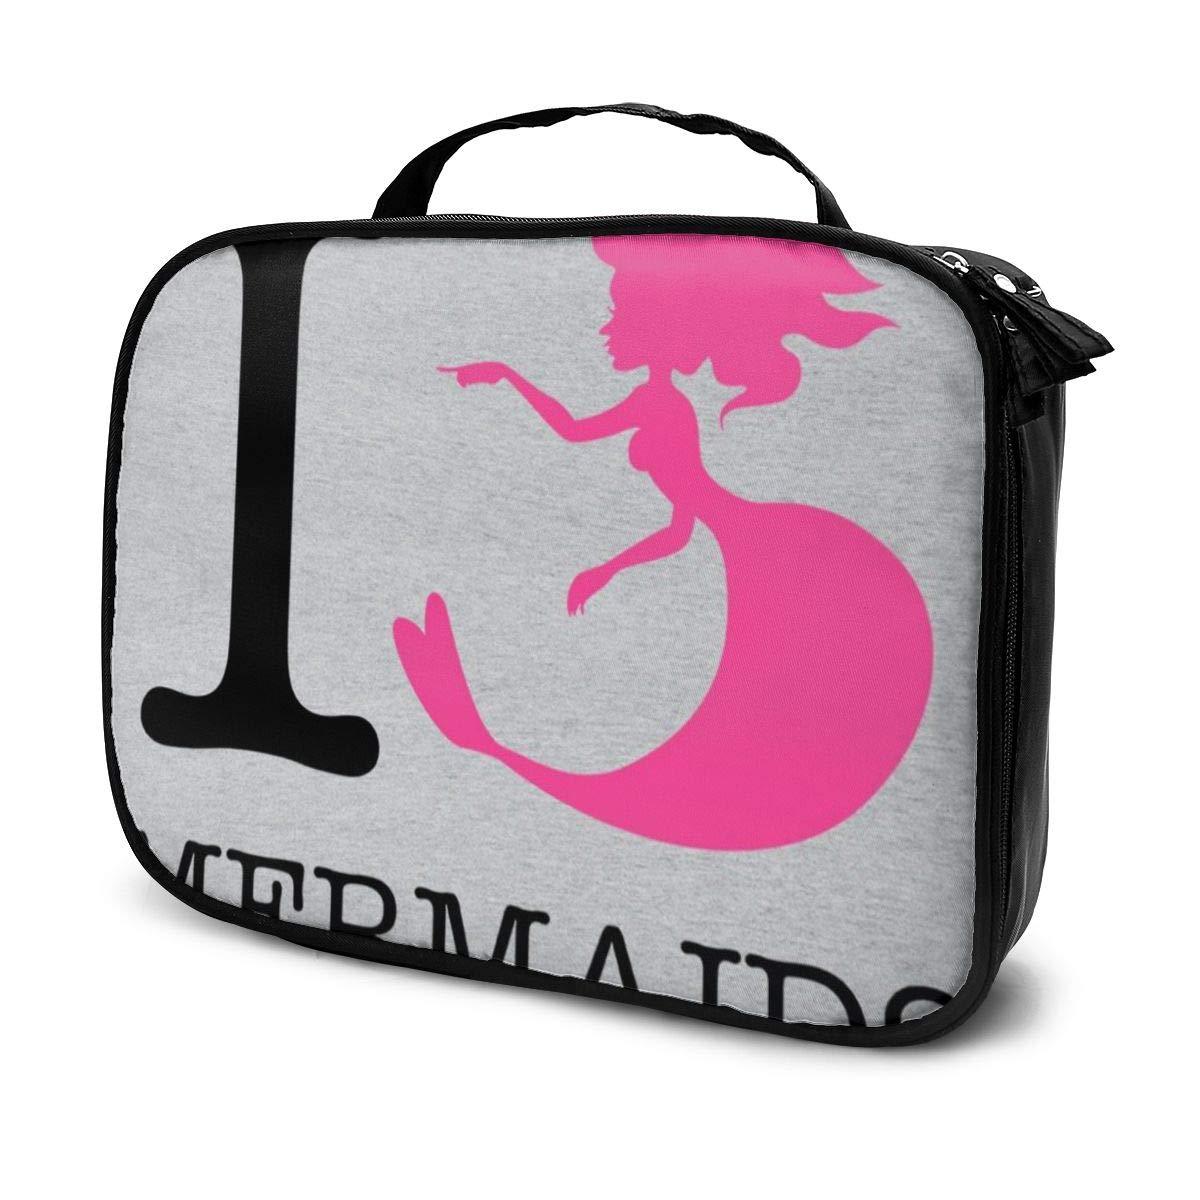 Makeup Bag Cosmetic Pouch Heart Mermaids Multi-Functional Bag Travel Kit